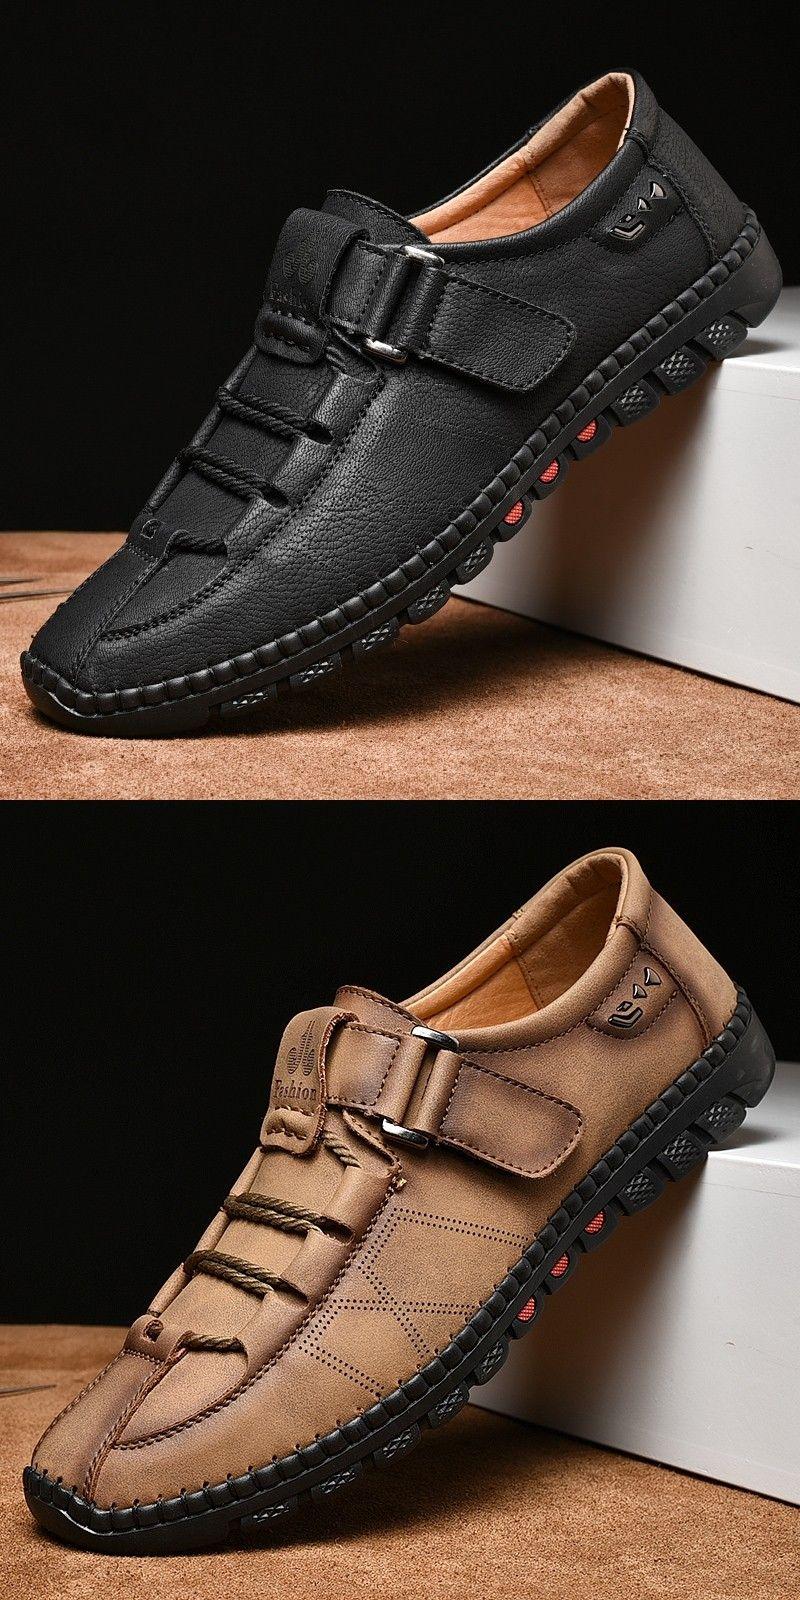 Prelesty Latest Mode Men Formal Shoes Gentleman Fashion Premium Genuine Cow Leather Driving Buckle